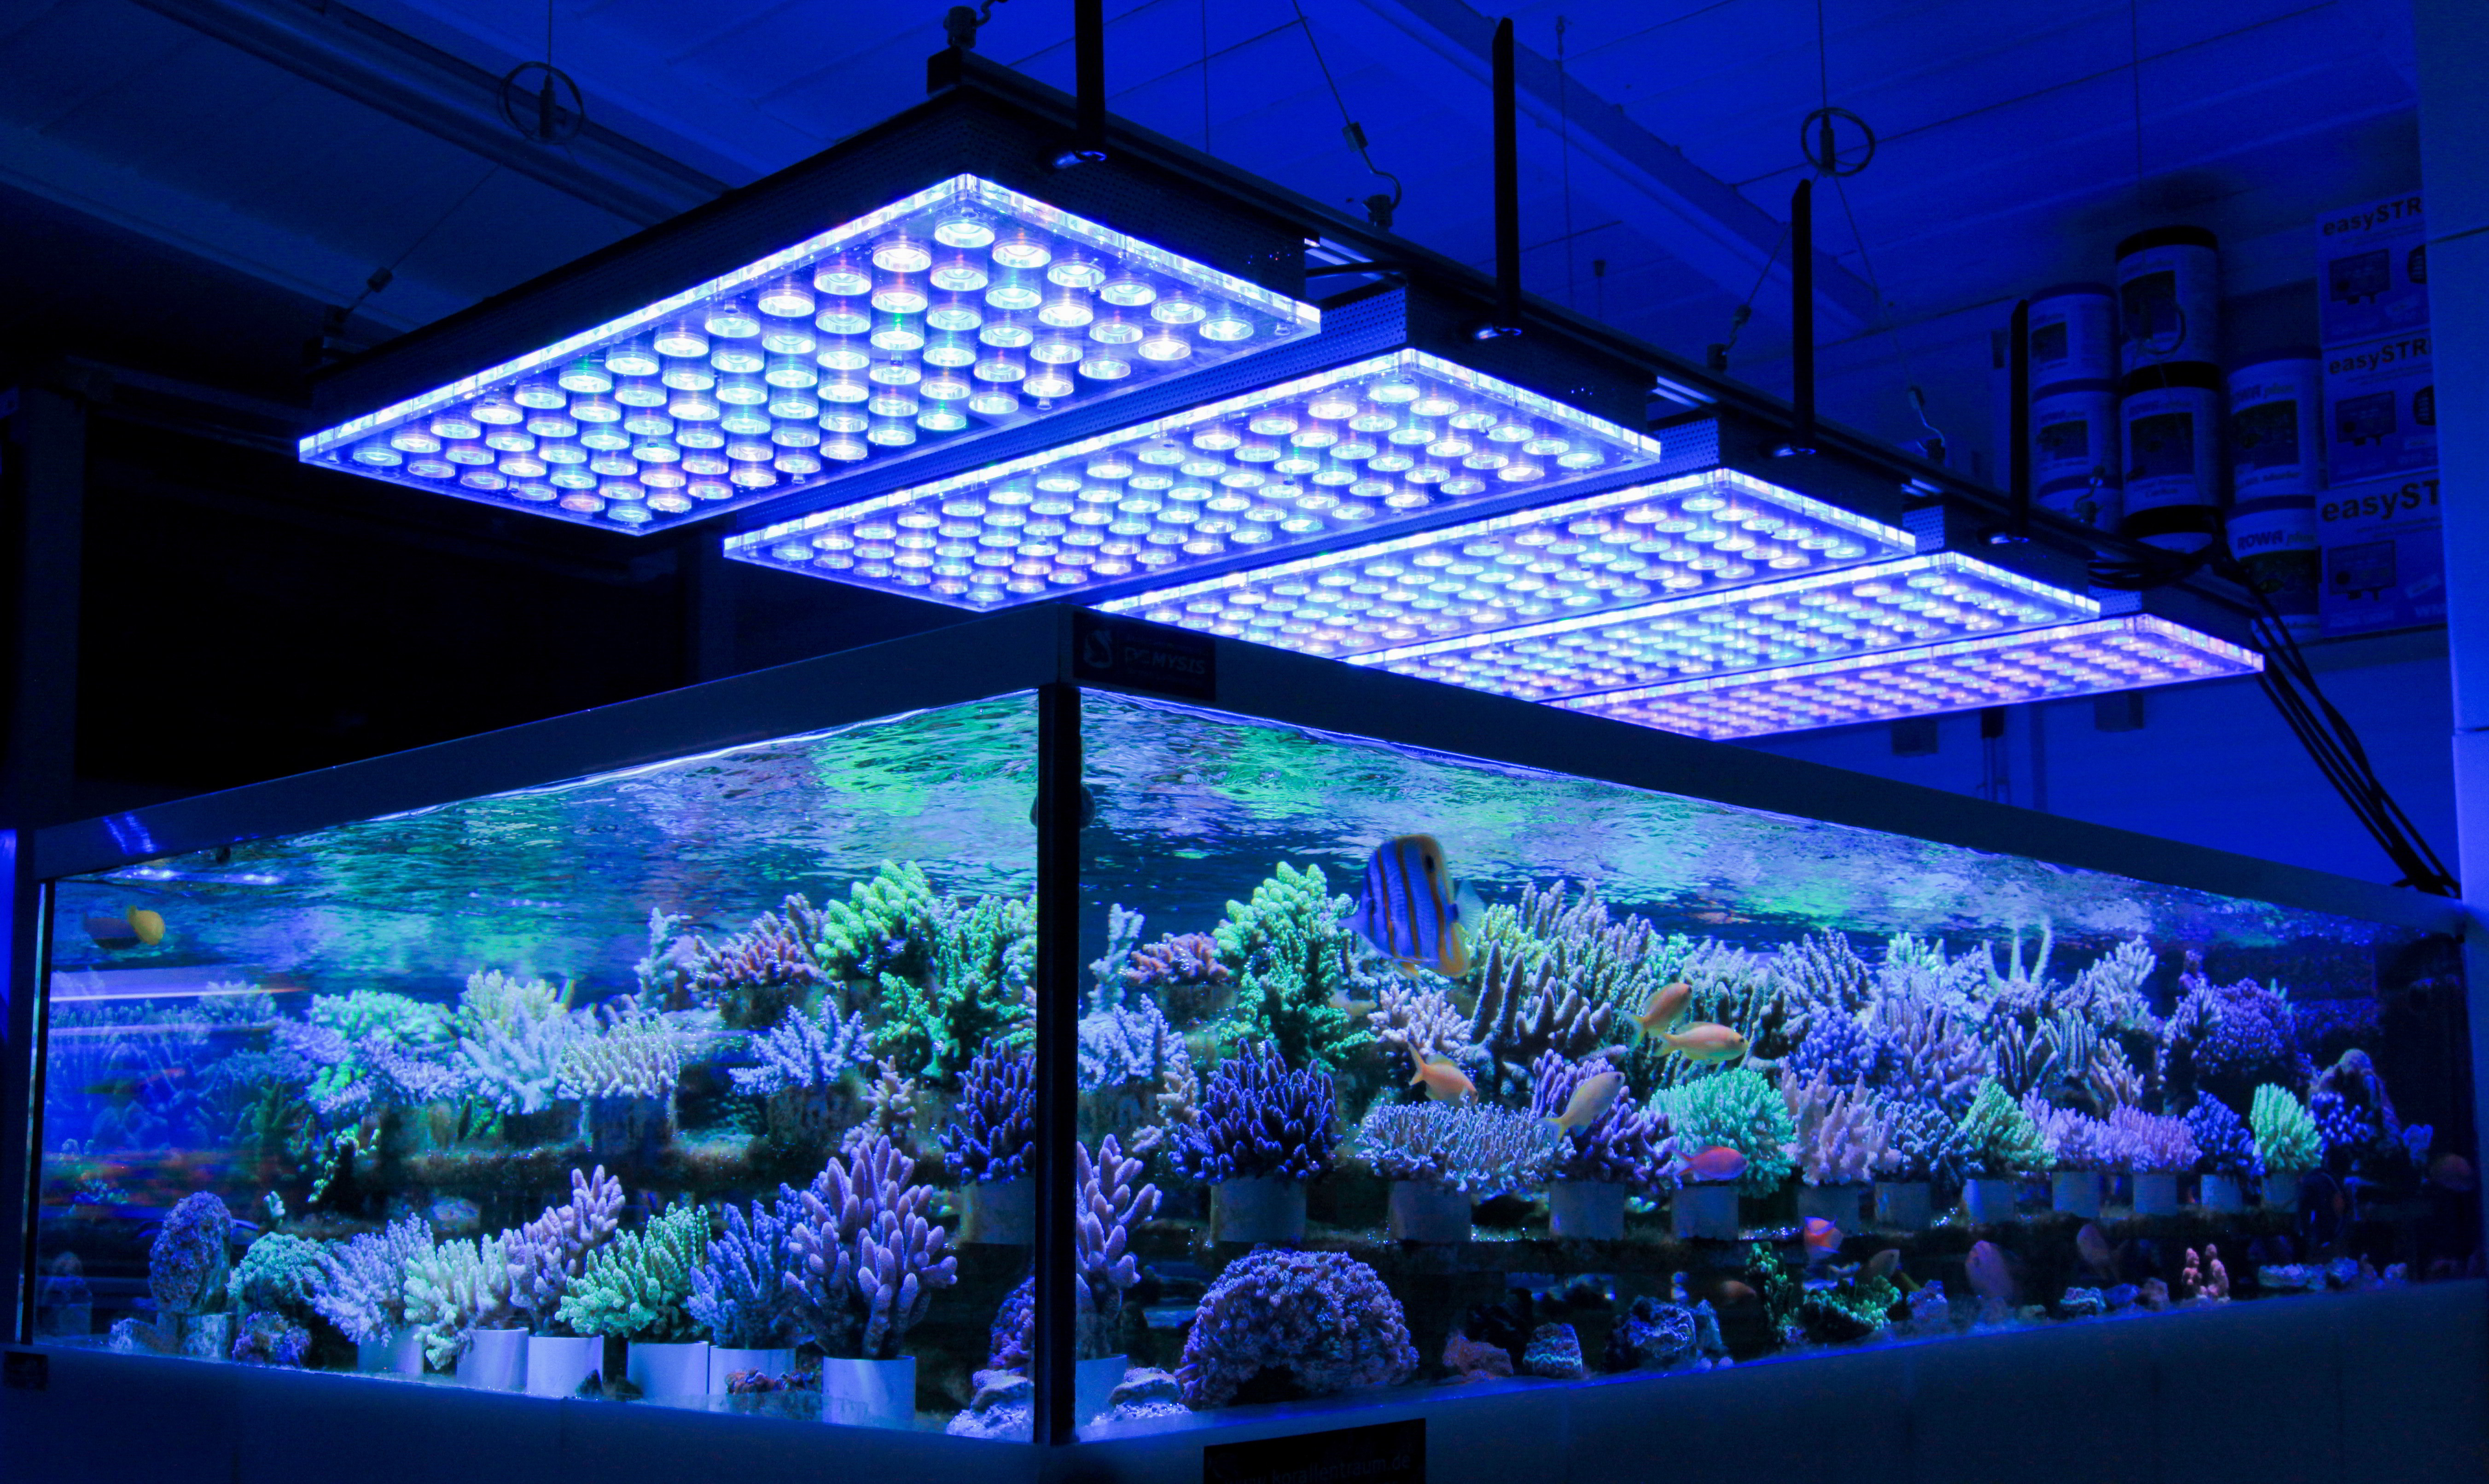 Best ideas about Led Aquarium Lights . Save or Pin German Store Displays Beautiful Coral Atlantik V4 LED Now.